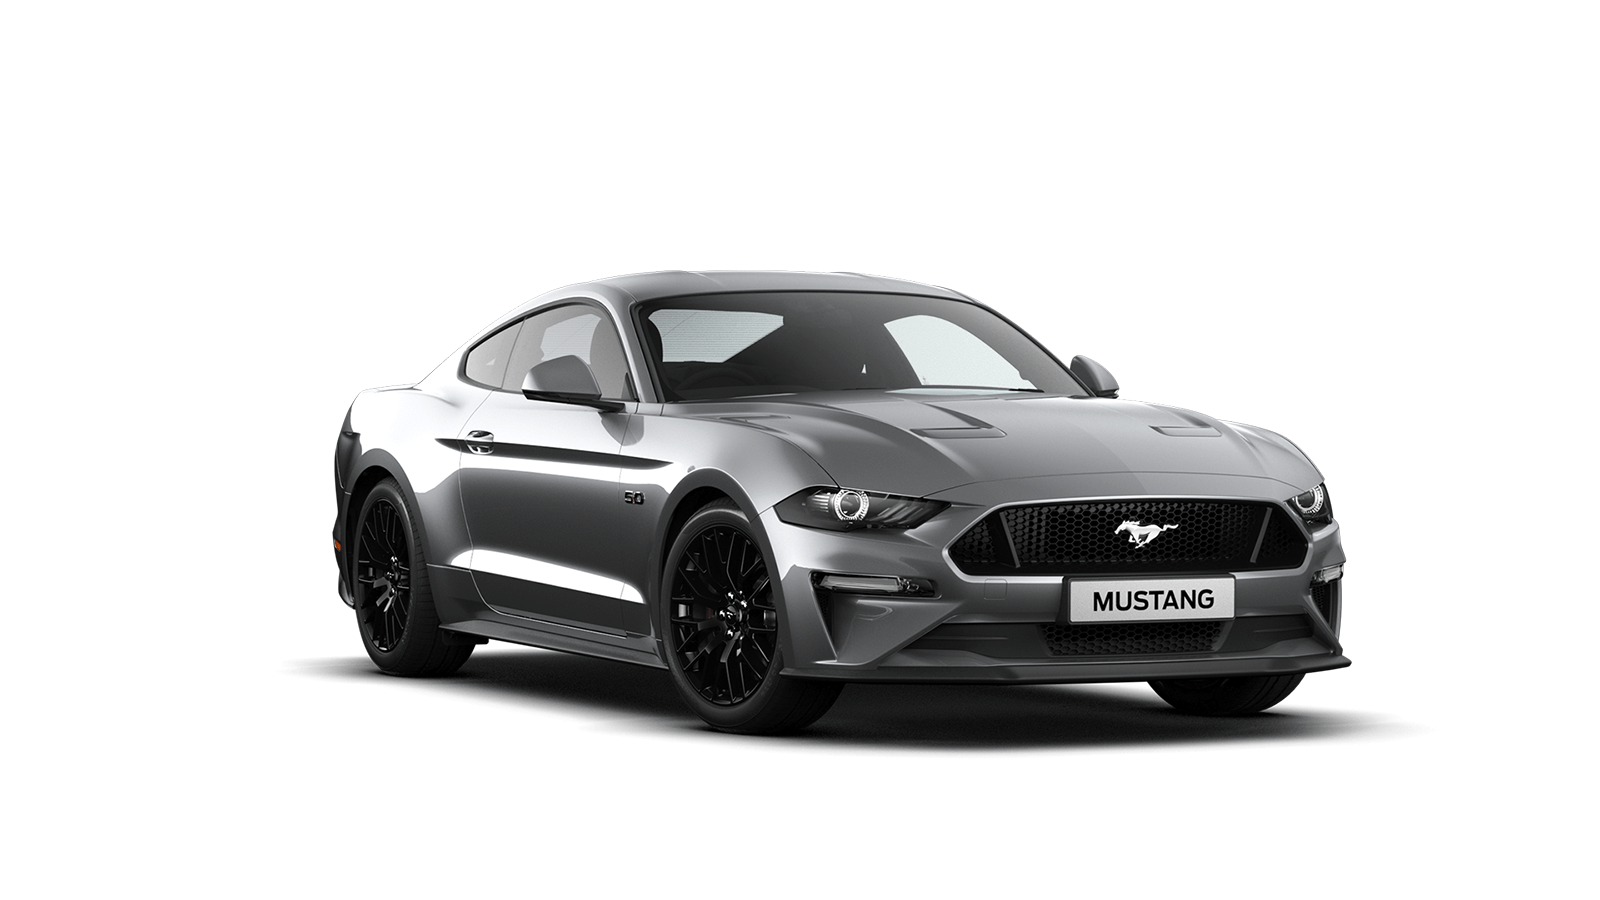 NEW MUSTANG 5.0 V8 GT Fastback in Ingot Silver